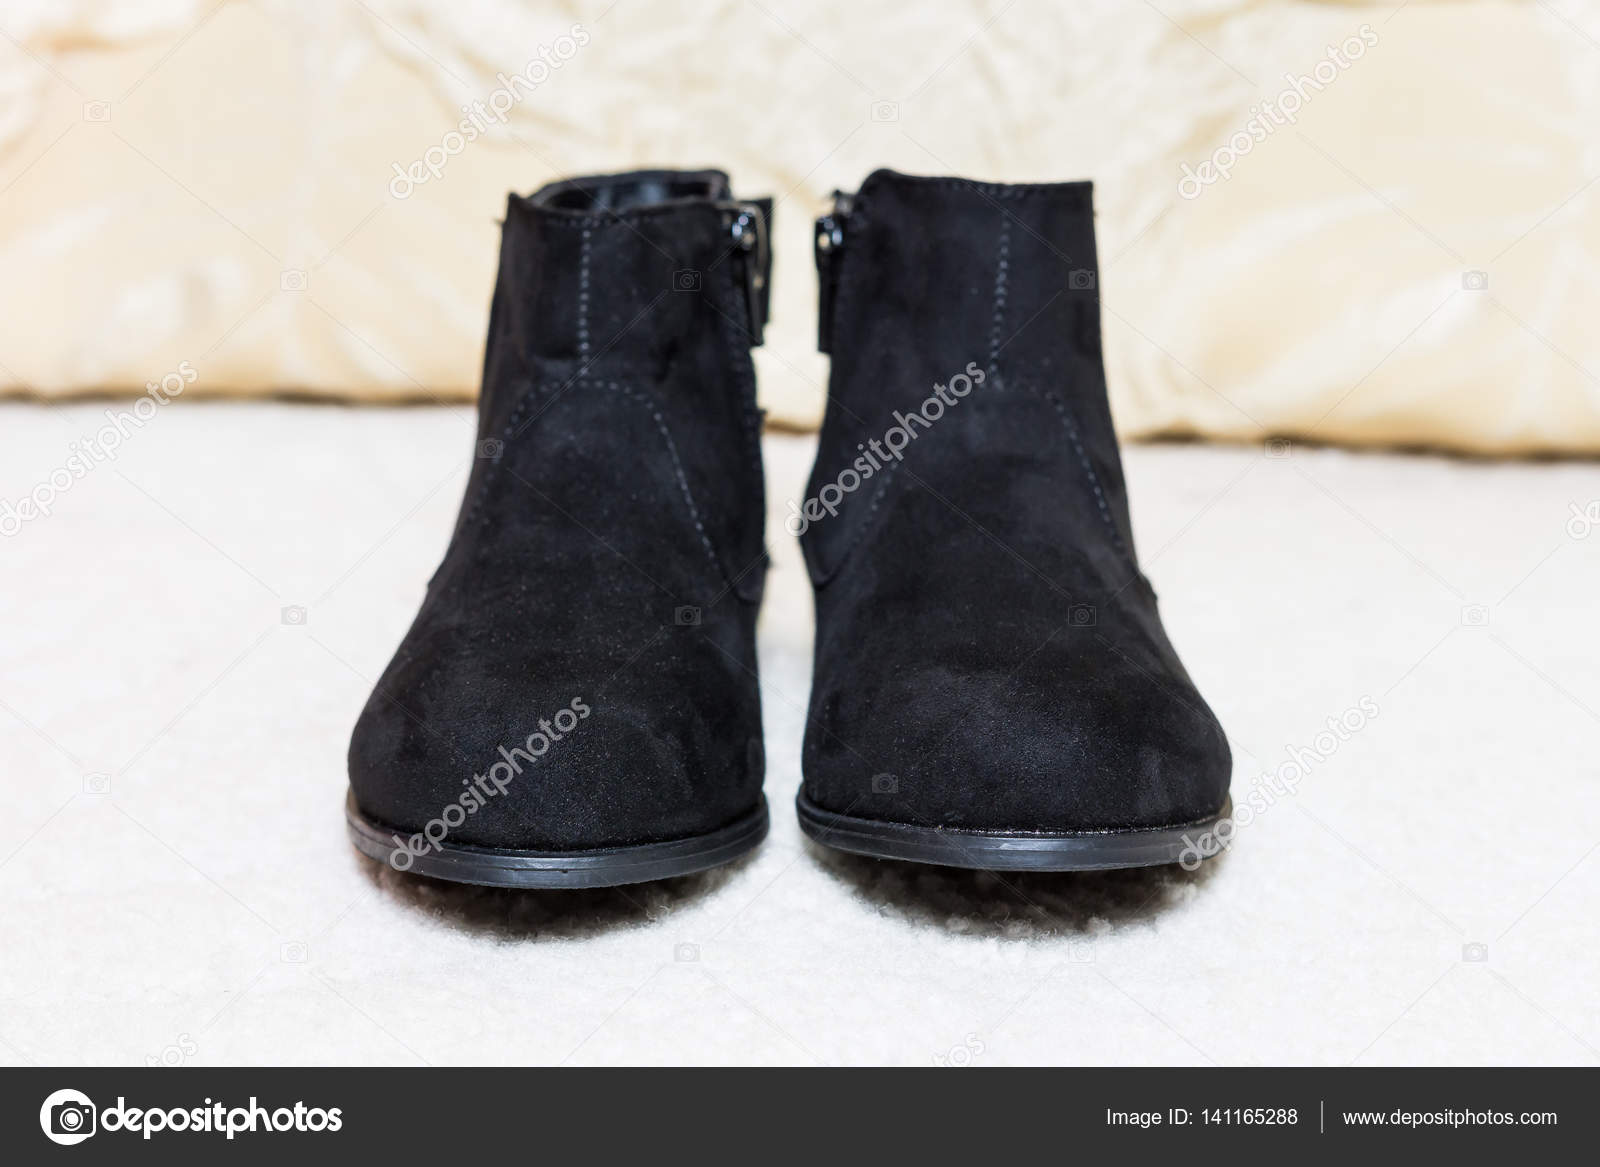 d9c974dada2 Νέα Sparkly βελούδινο μαύρο ζεστό μπότες για τα παιδιά για το φθινόπωρο- χειμώνα με φιόγκο